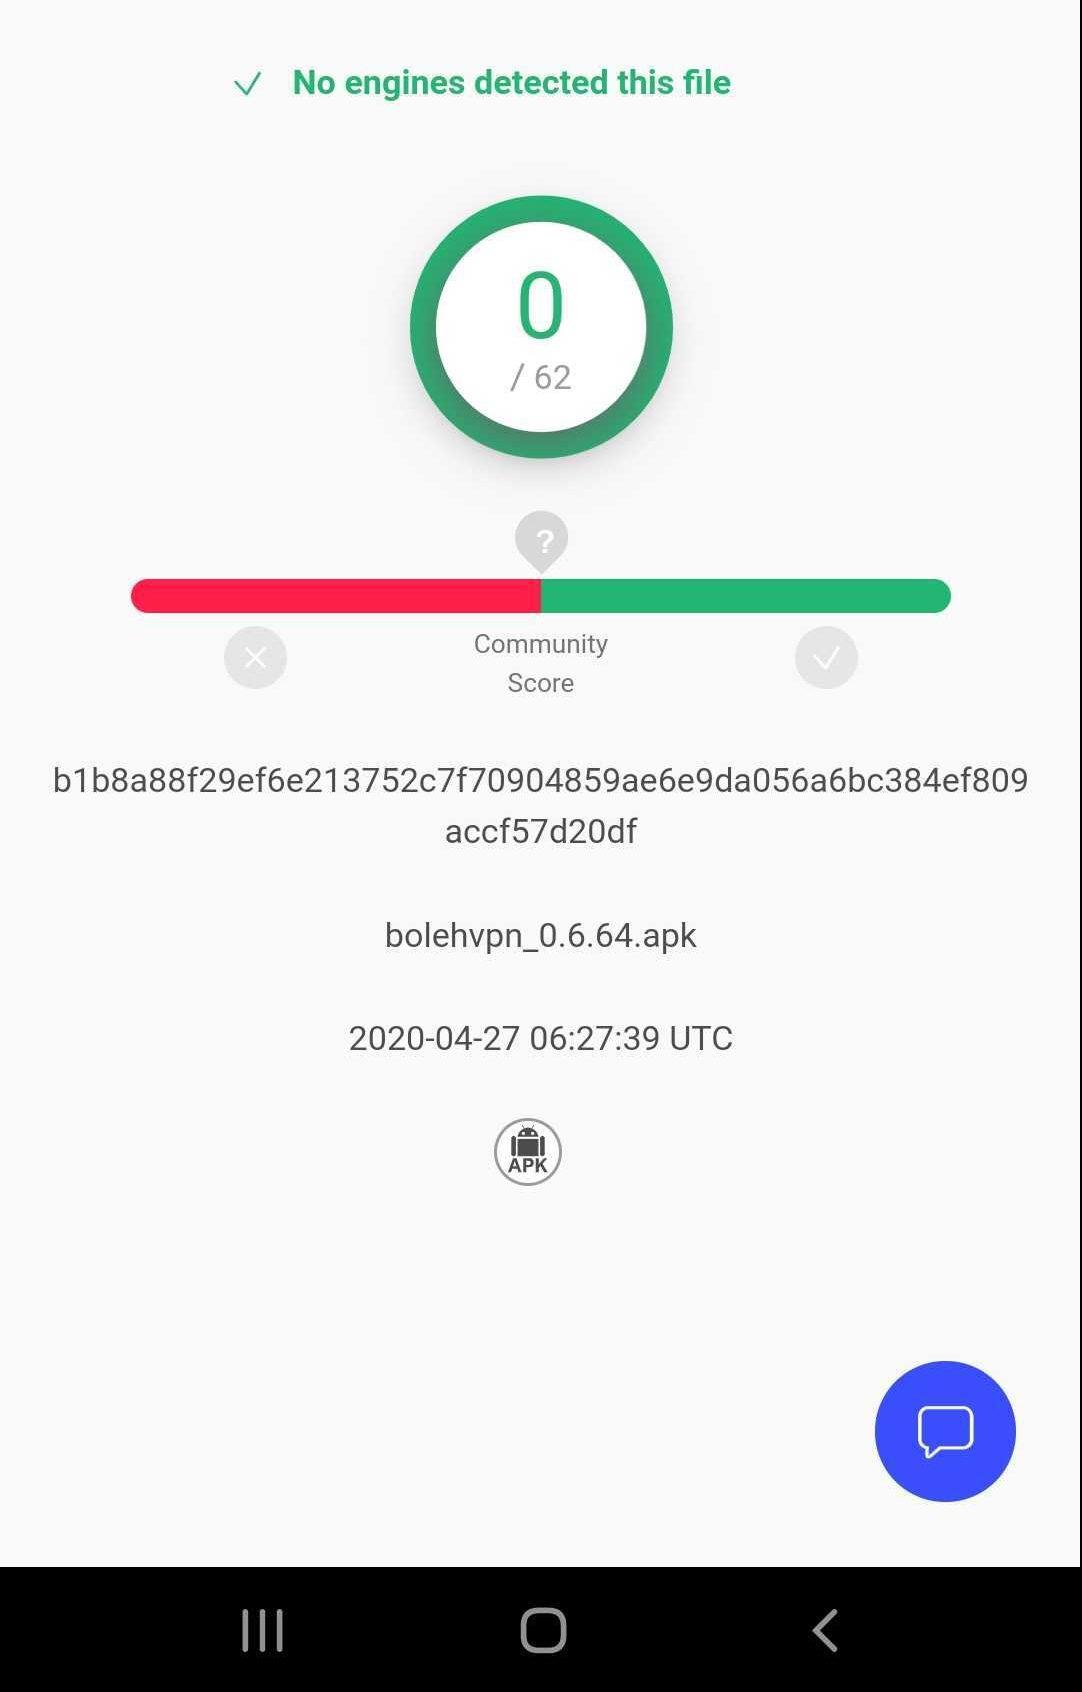 BolehVPN Scan Android